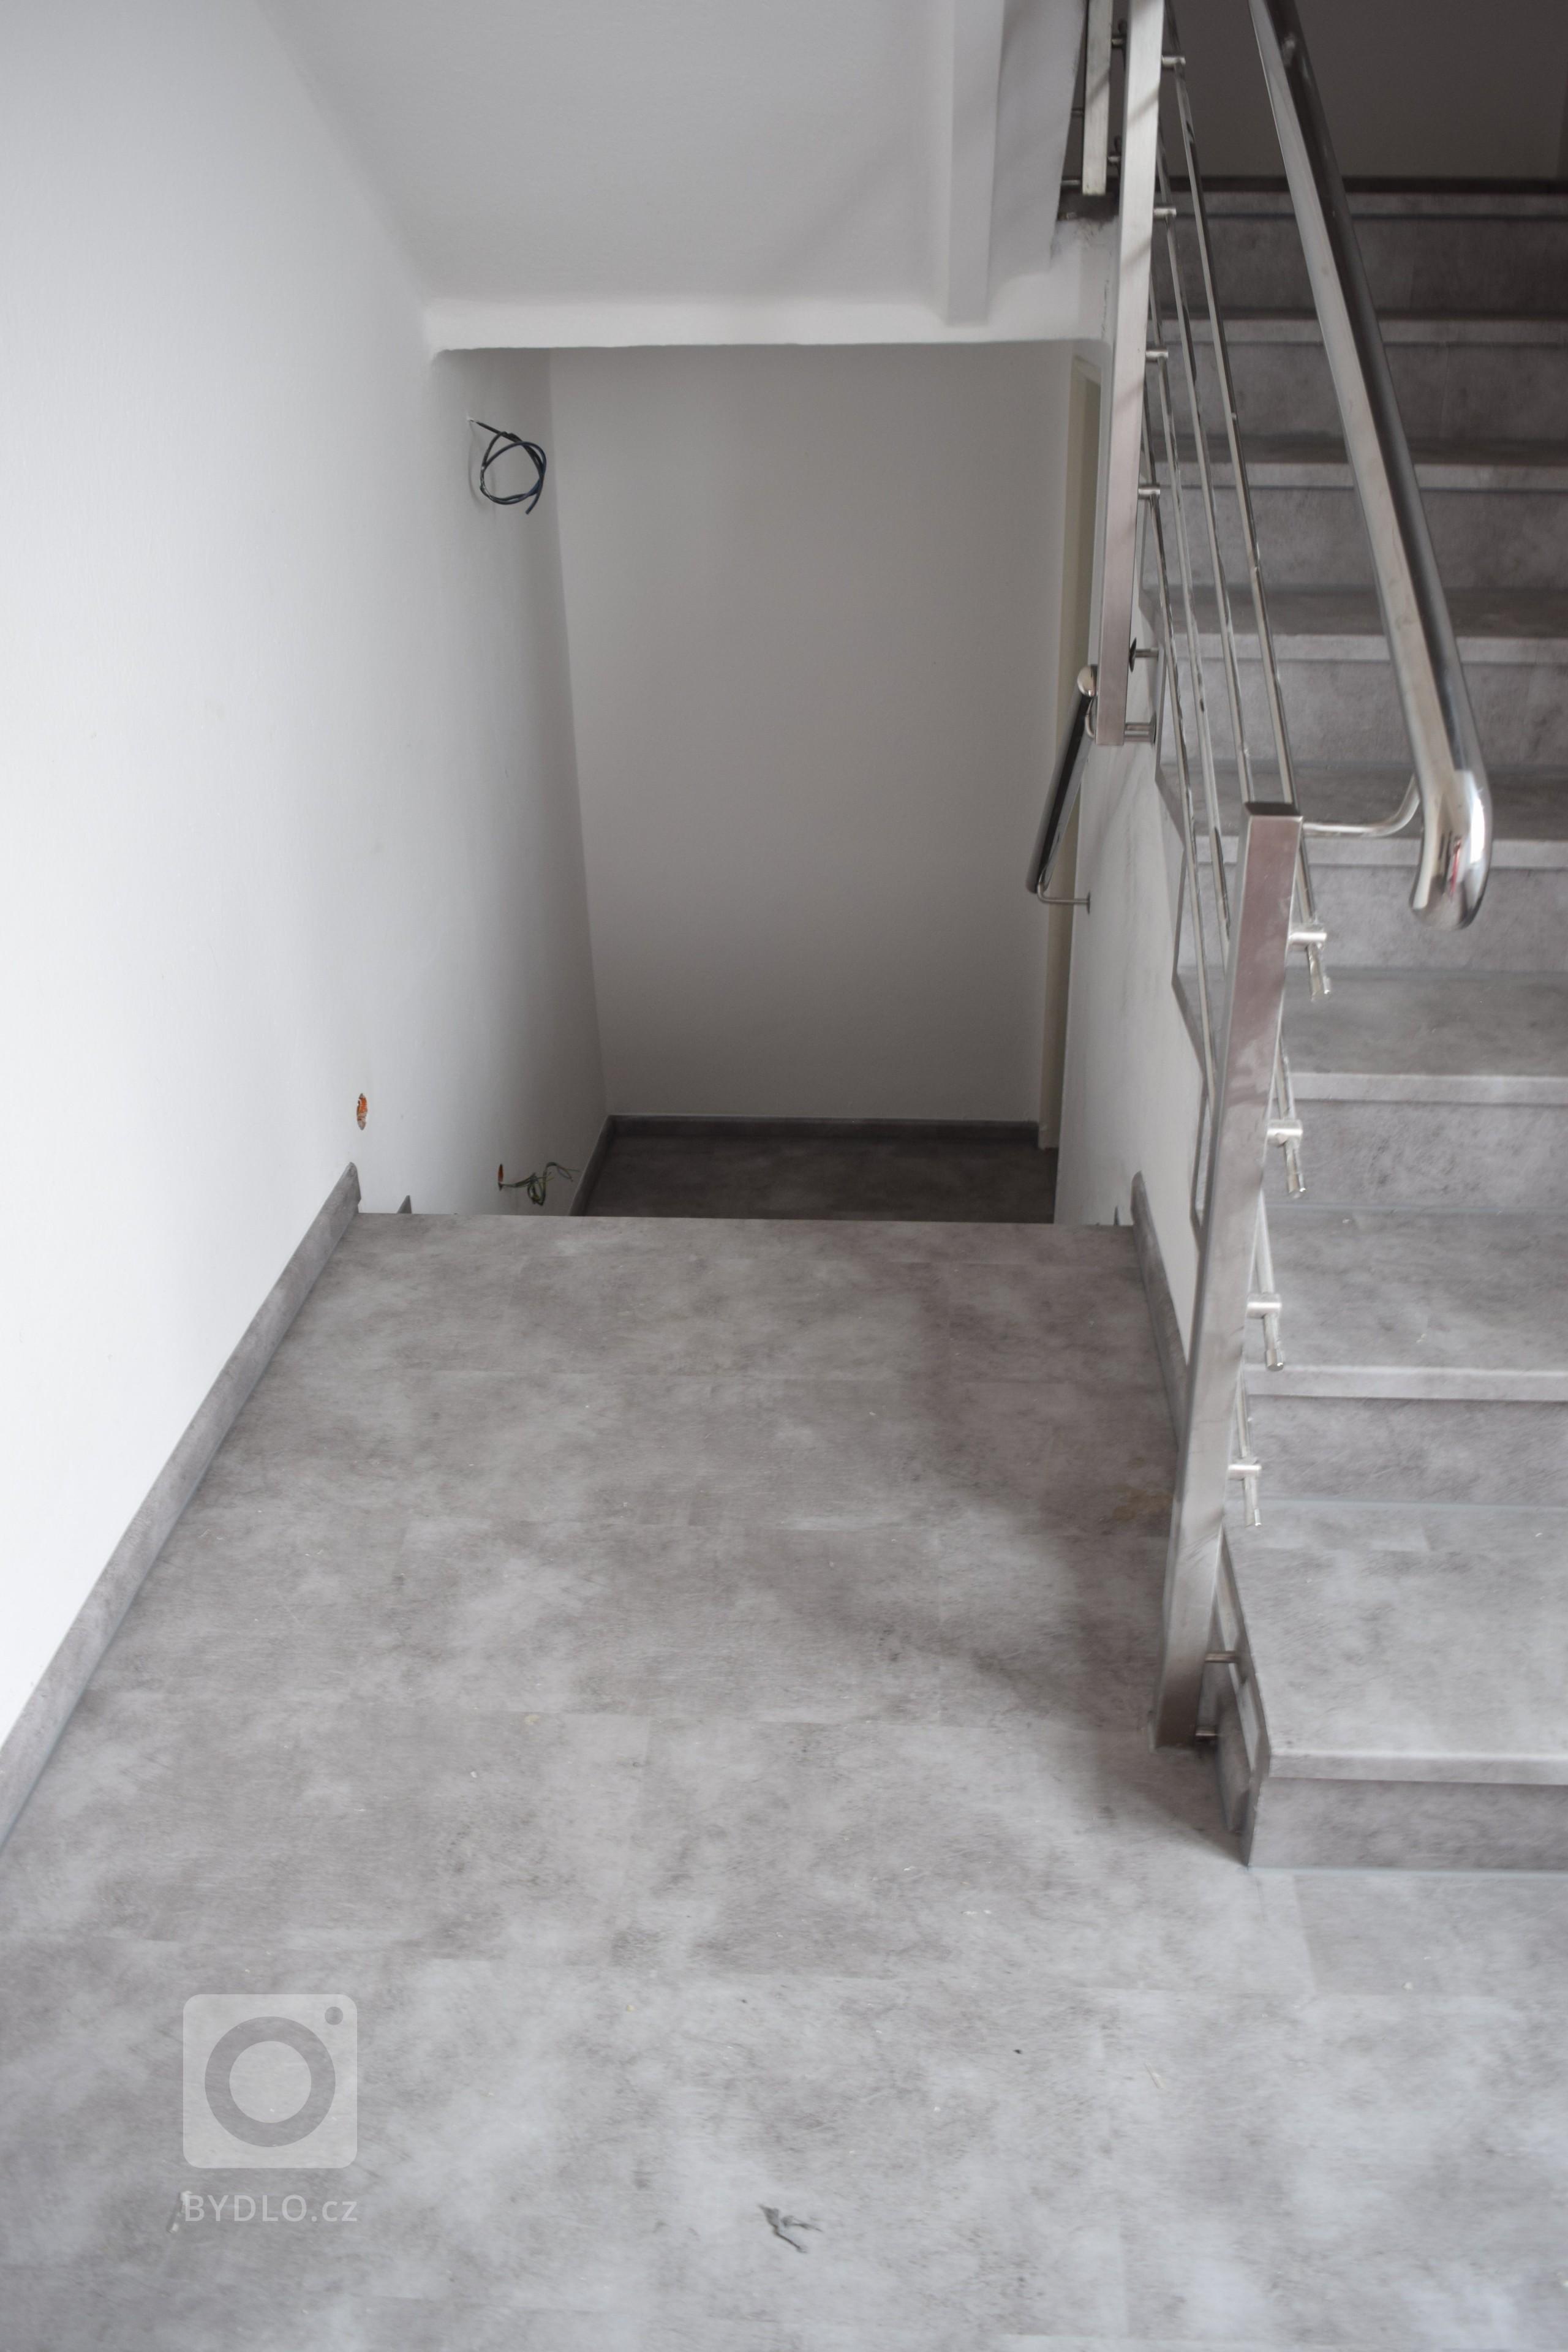 Po renovaci - nainstalovaná vinylová podlaha s imitací kamene - BUKOMA STONE CLICK - dekor Kámen šedý